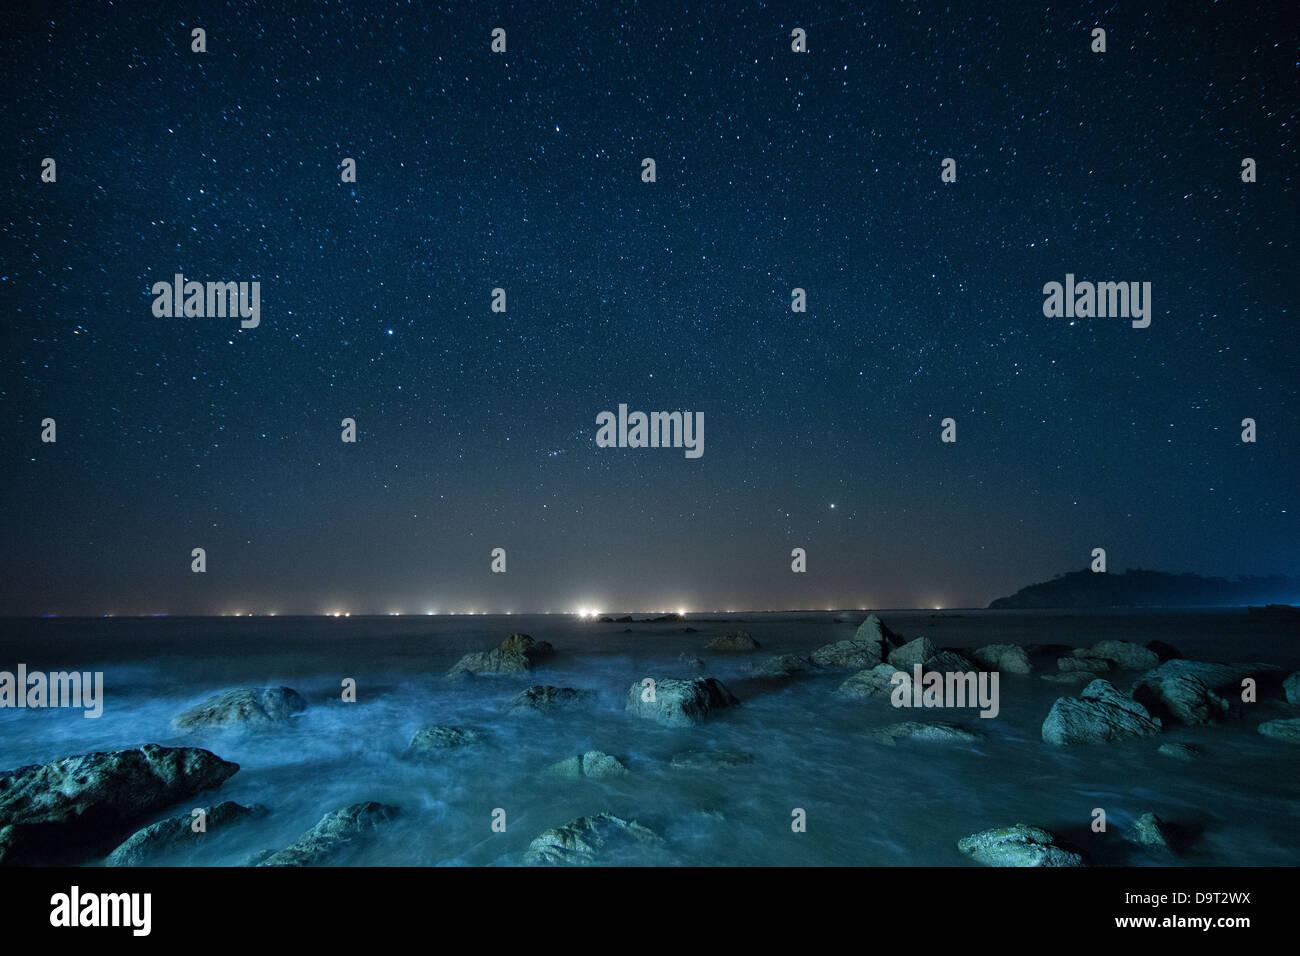 the night sky over the Bay of Bengal, Ngapali Beach, Rakhine, Myanmar (Burma) - Stock Image